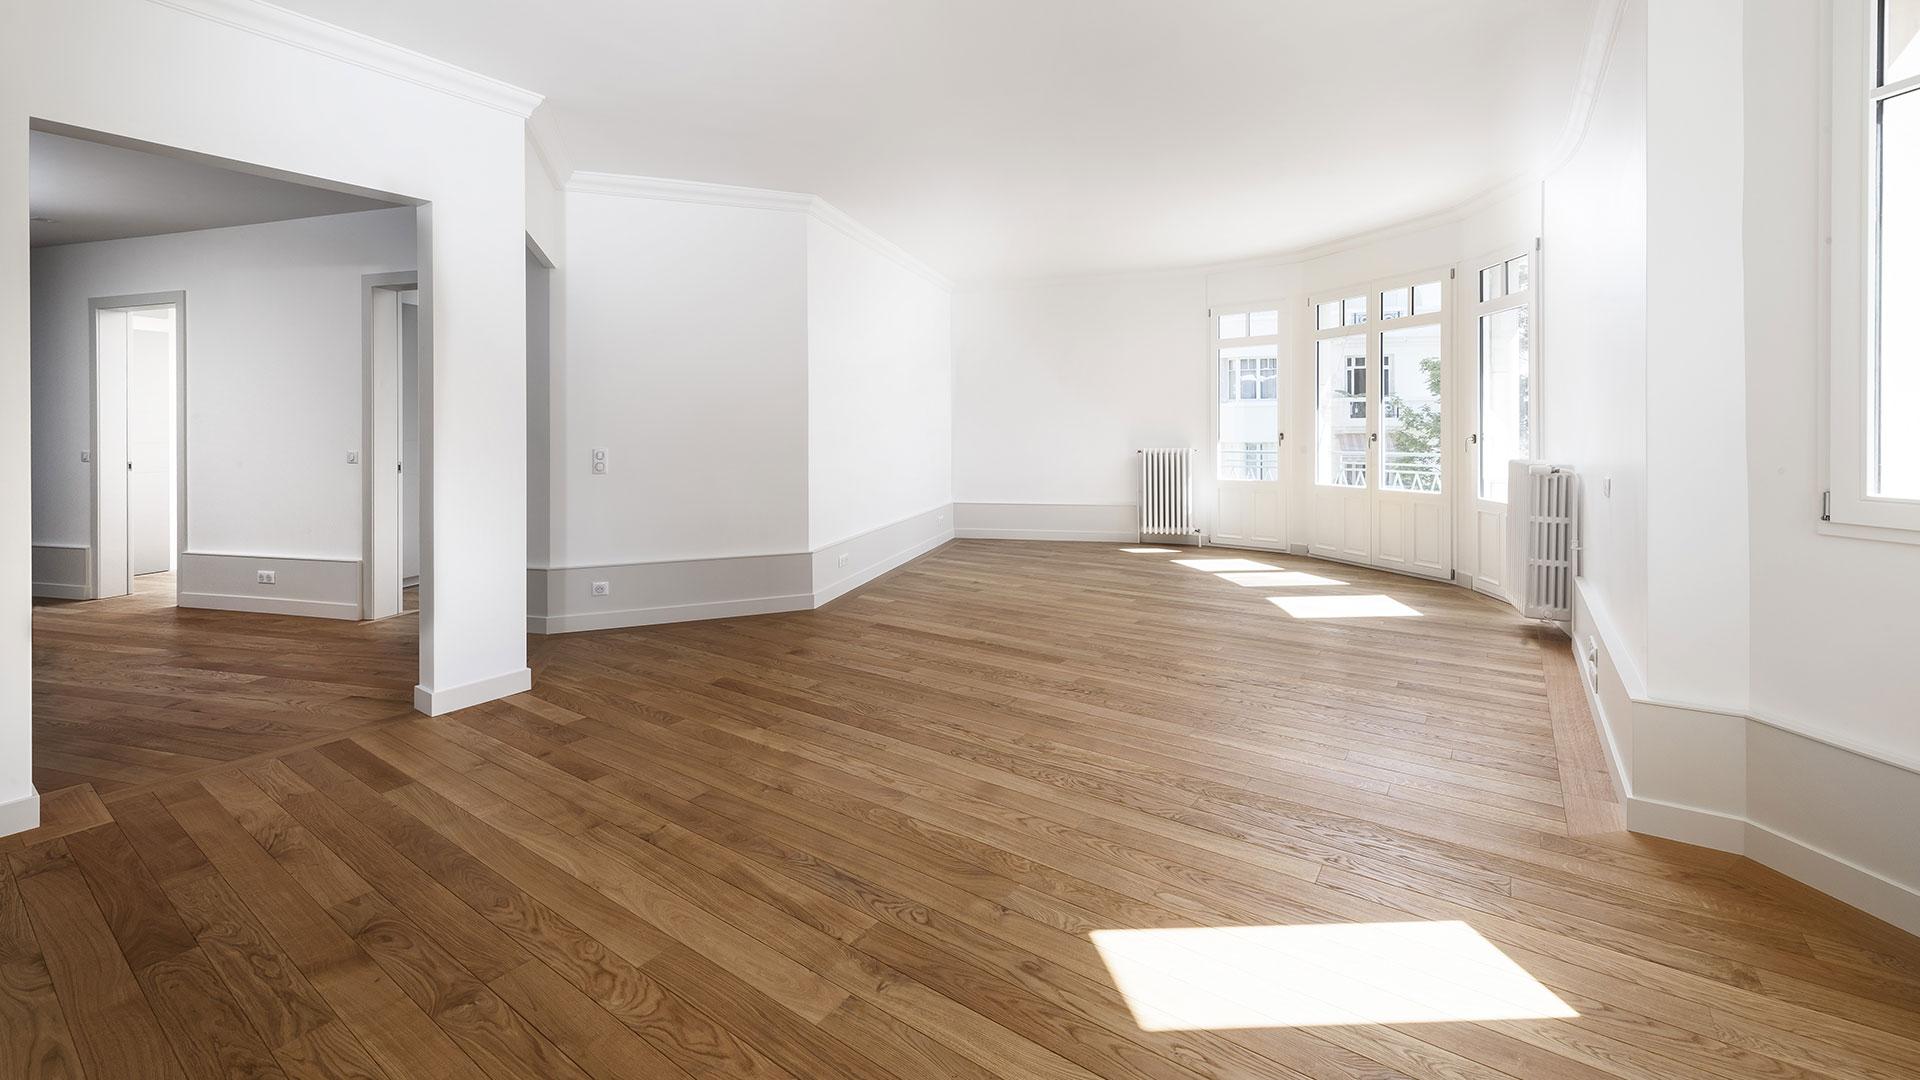 itup vente appartements annecy appartement t4 hyper. Black Bedroom Furniture Sets. Home Design Ideas